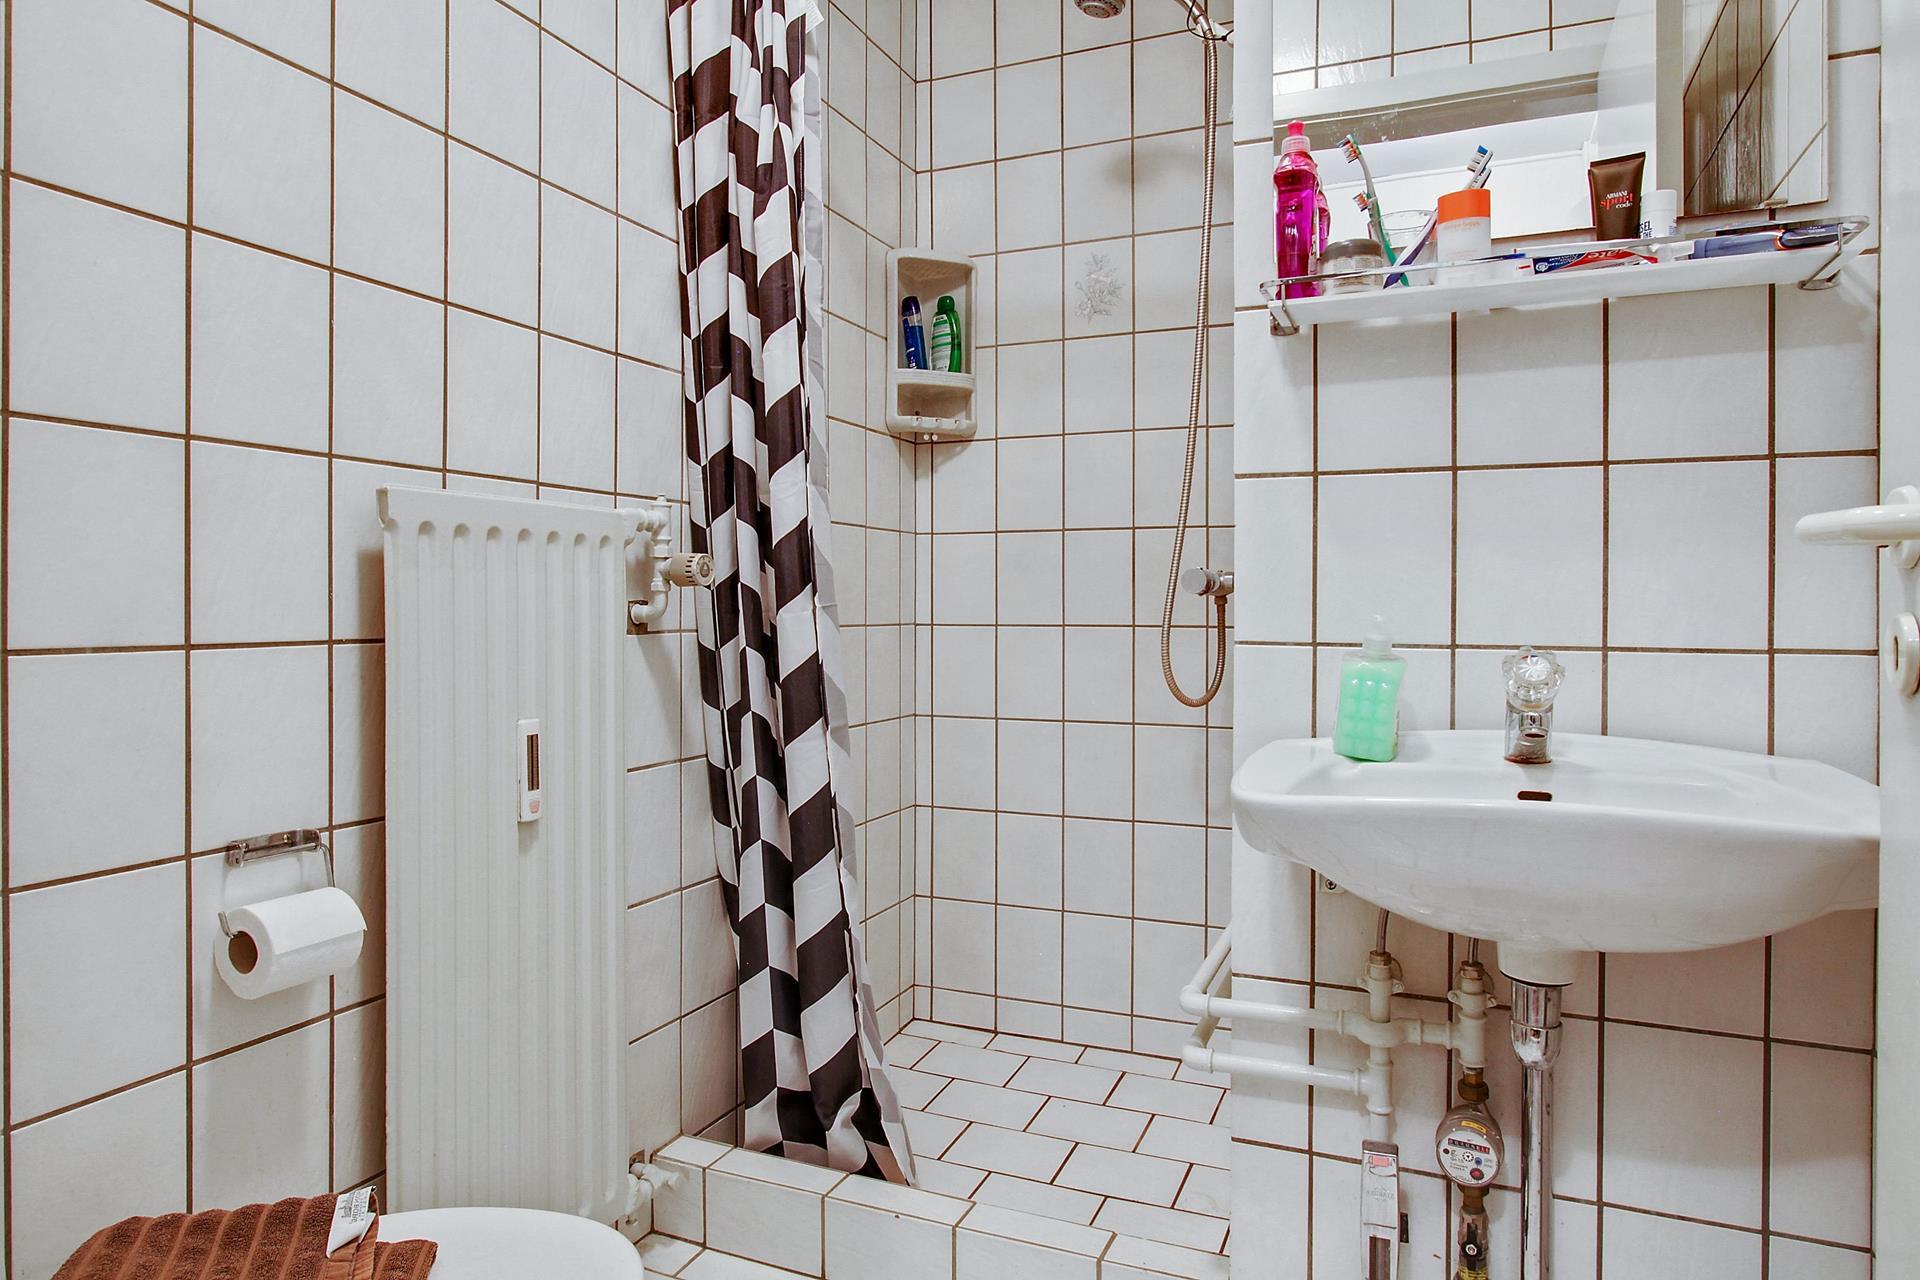 Bolig/erhverv på Struervej i Holstebro - Badeværelse